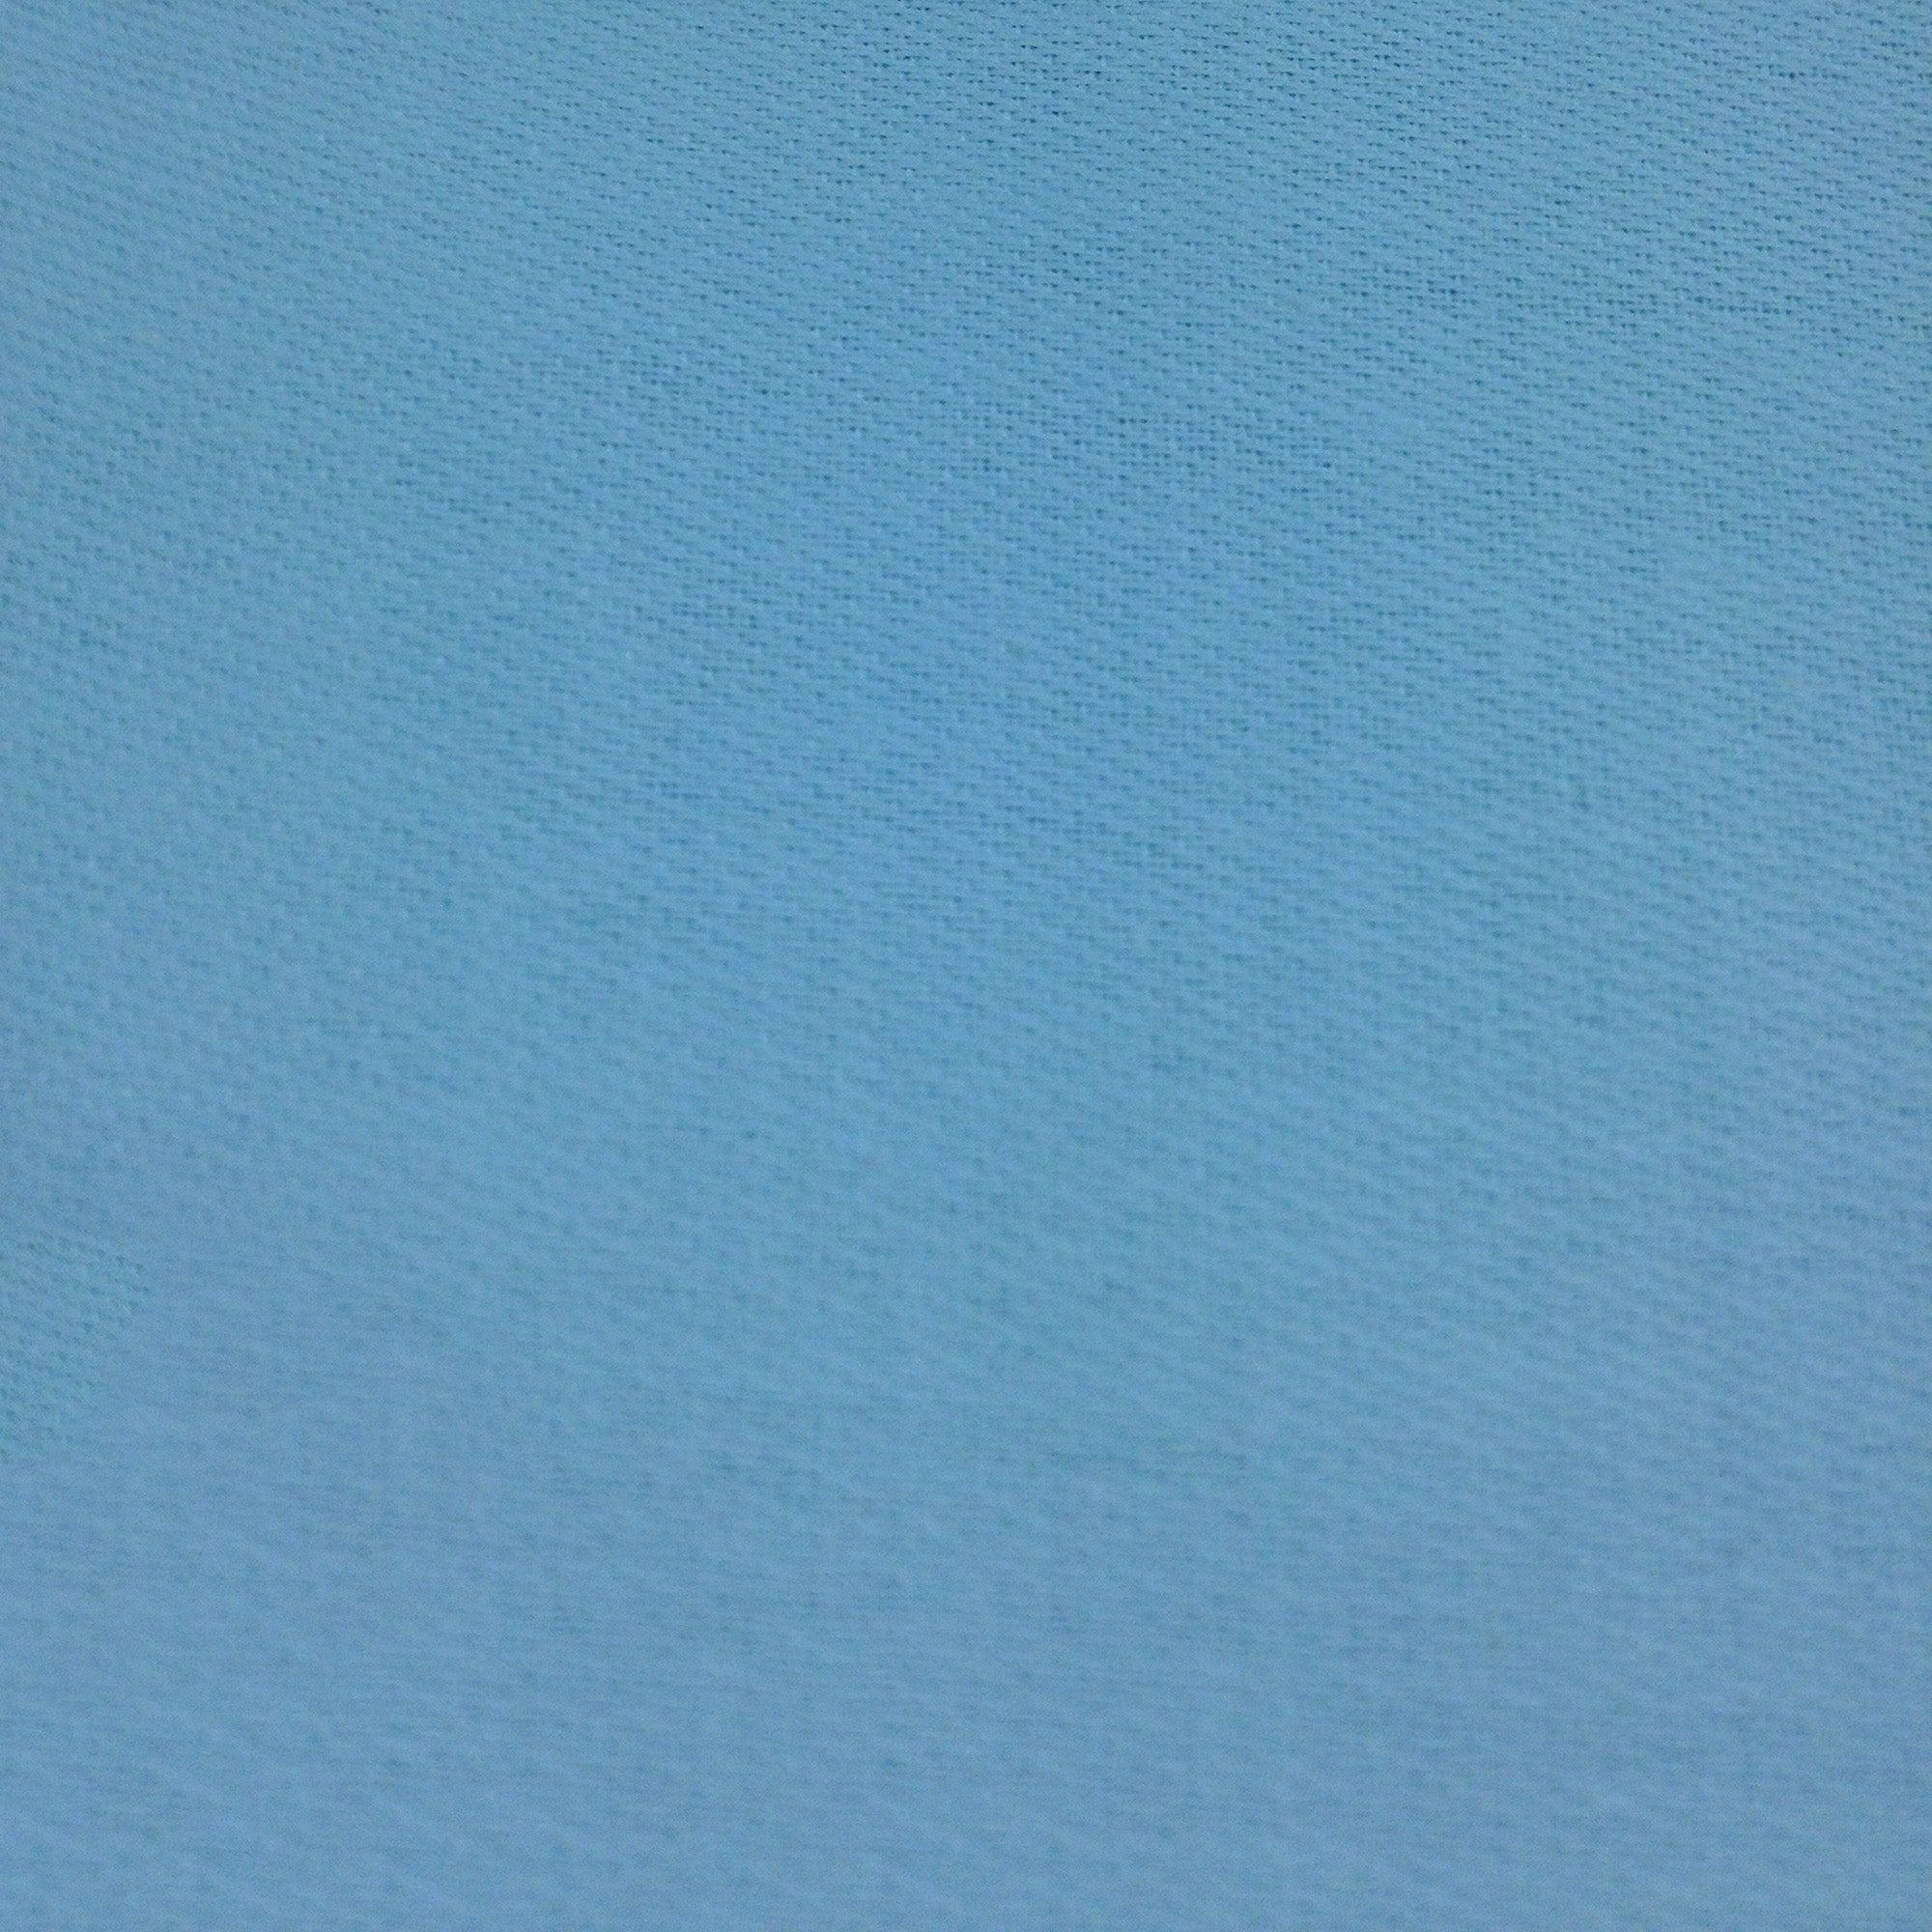 Sateen Lining Fabric